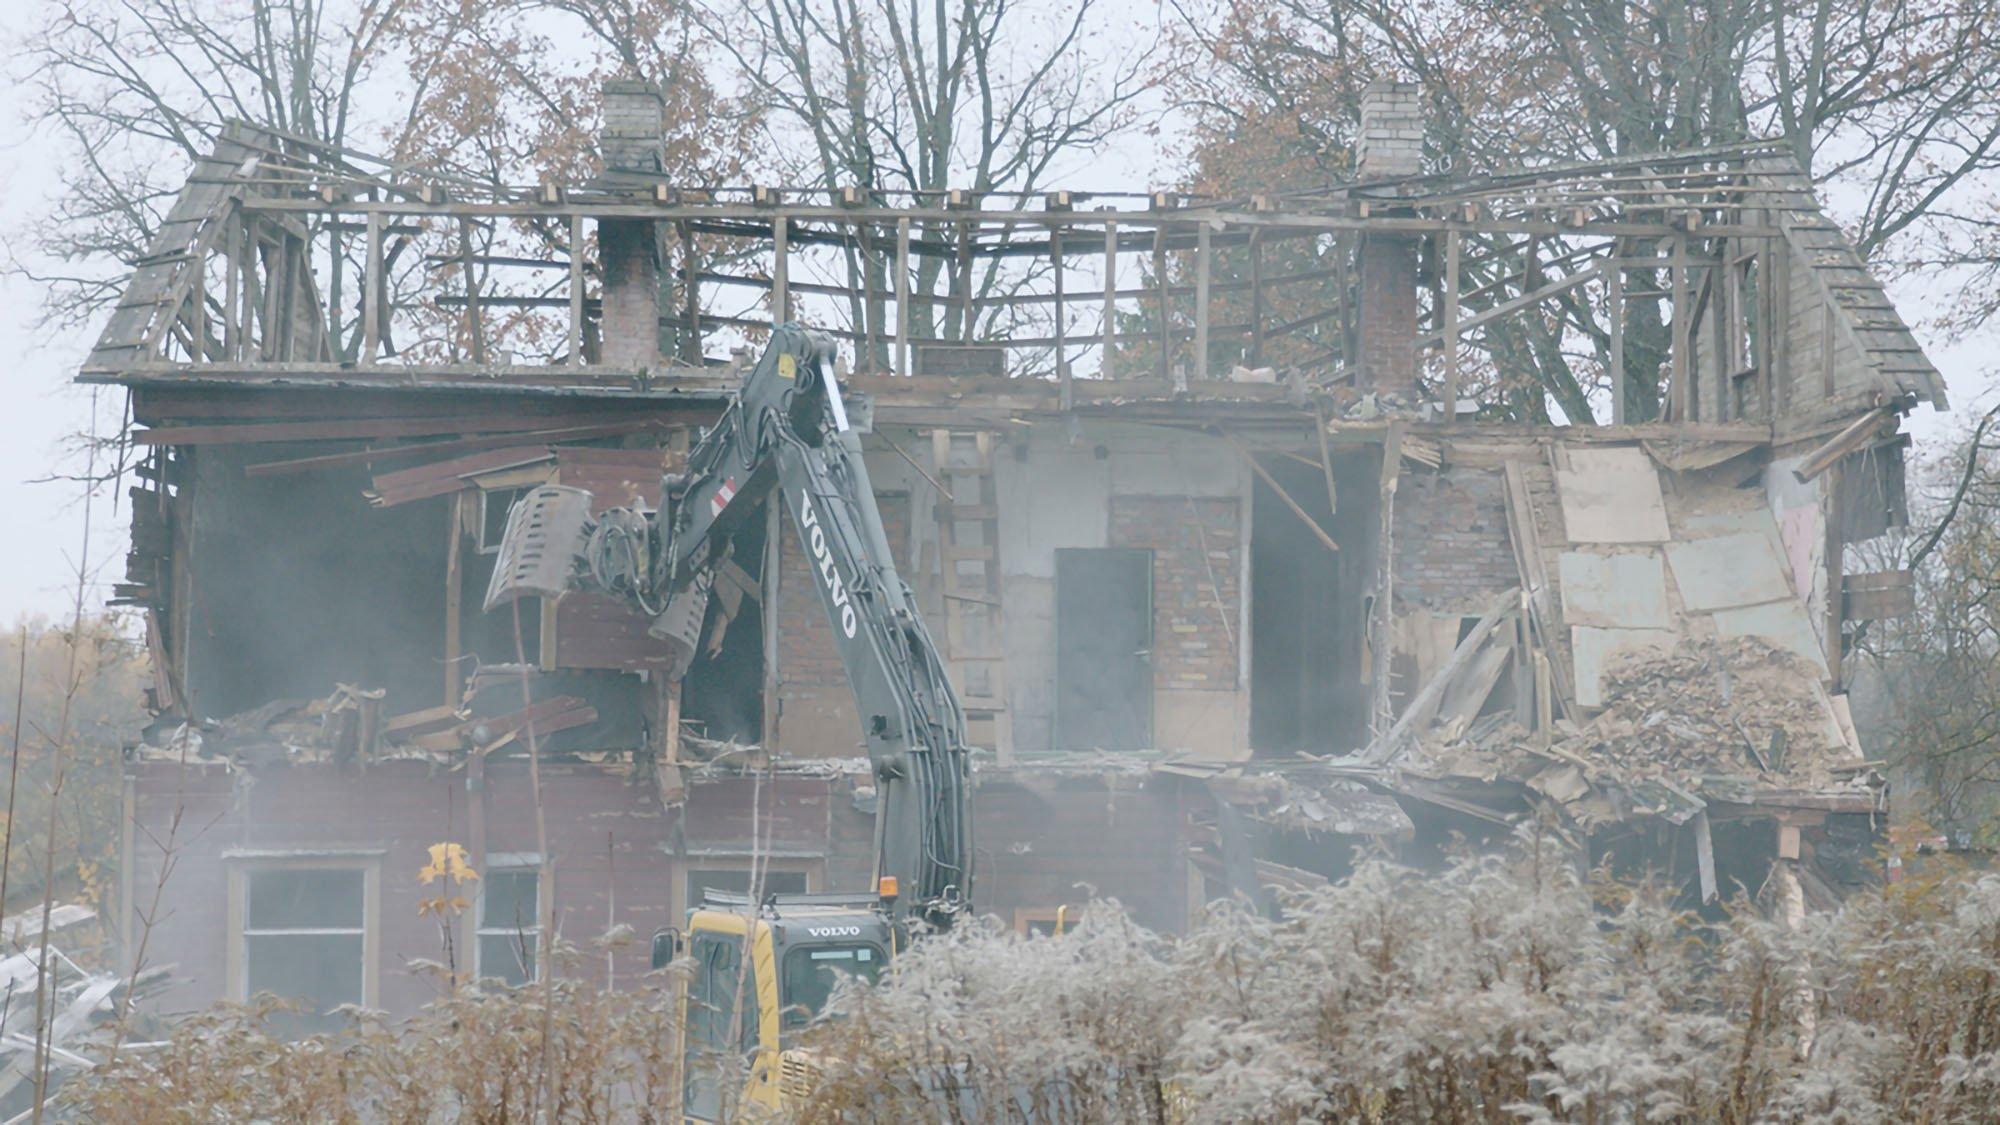 17_Frame del film_The demolition of an abandoned building in Valga ©Anna Hints